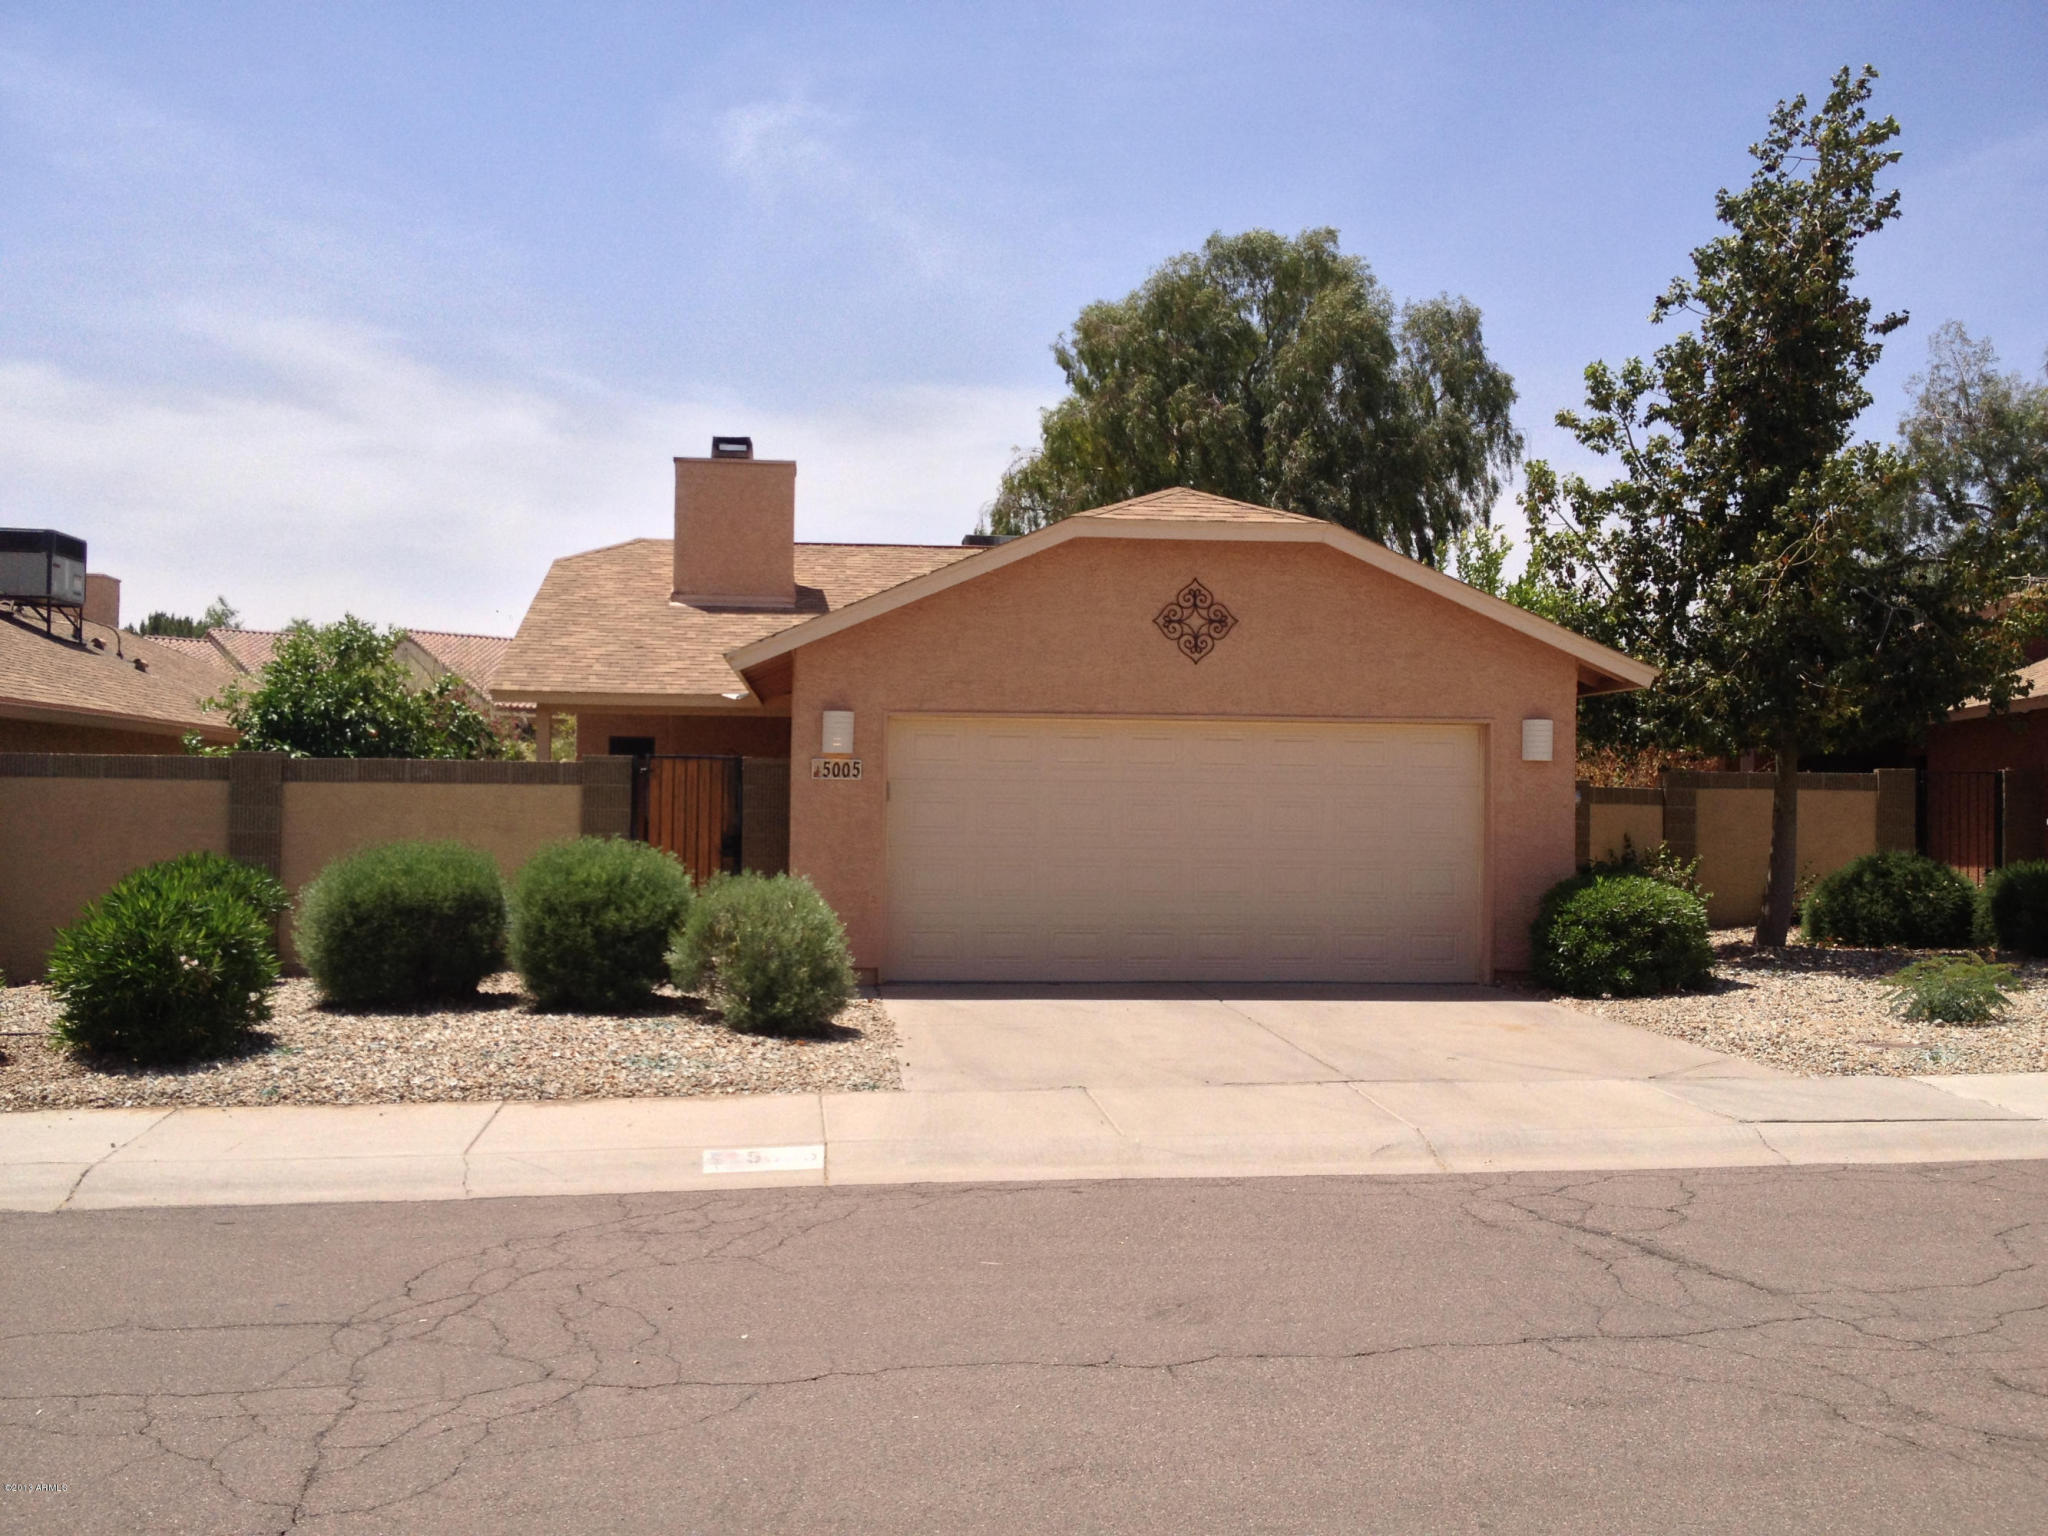 Who lives at 5005 Shomi St, Phoenix AZ | Rehold